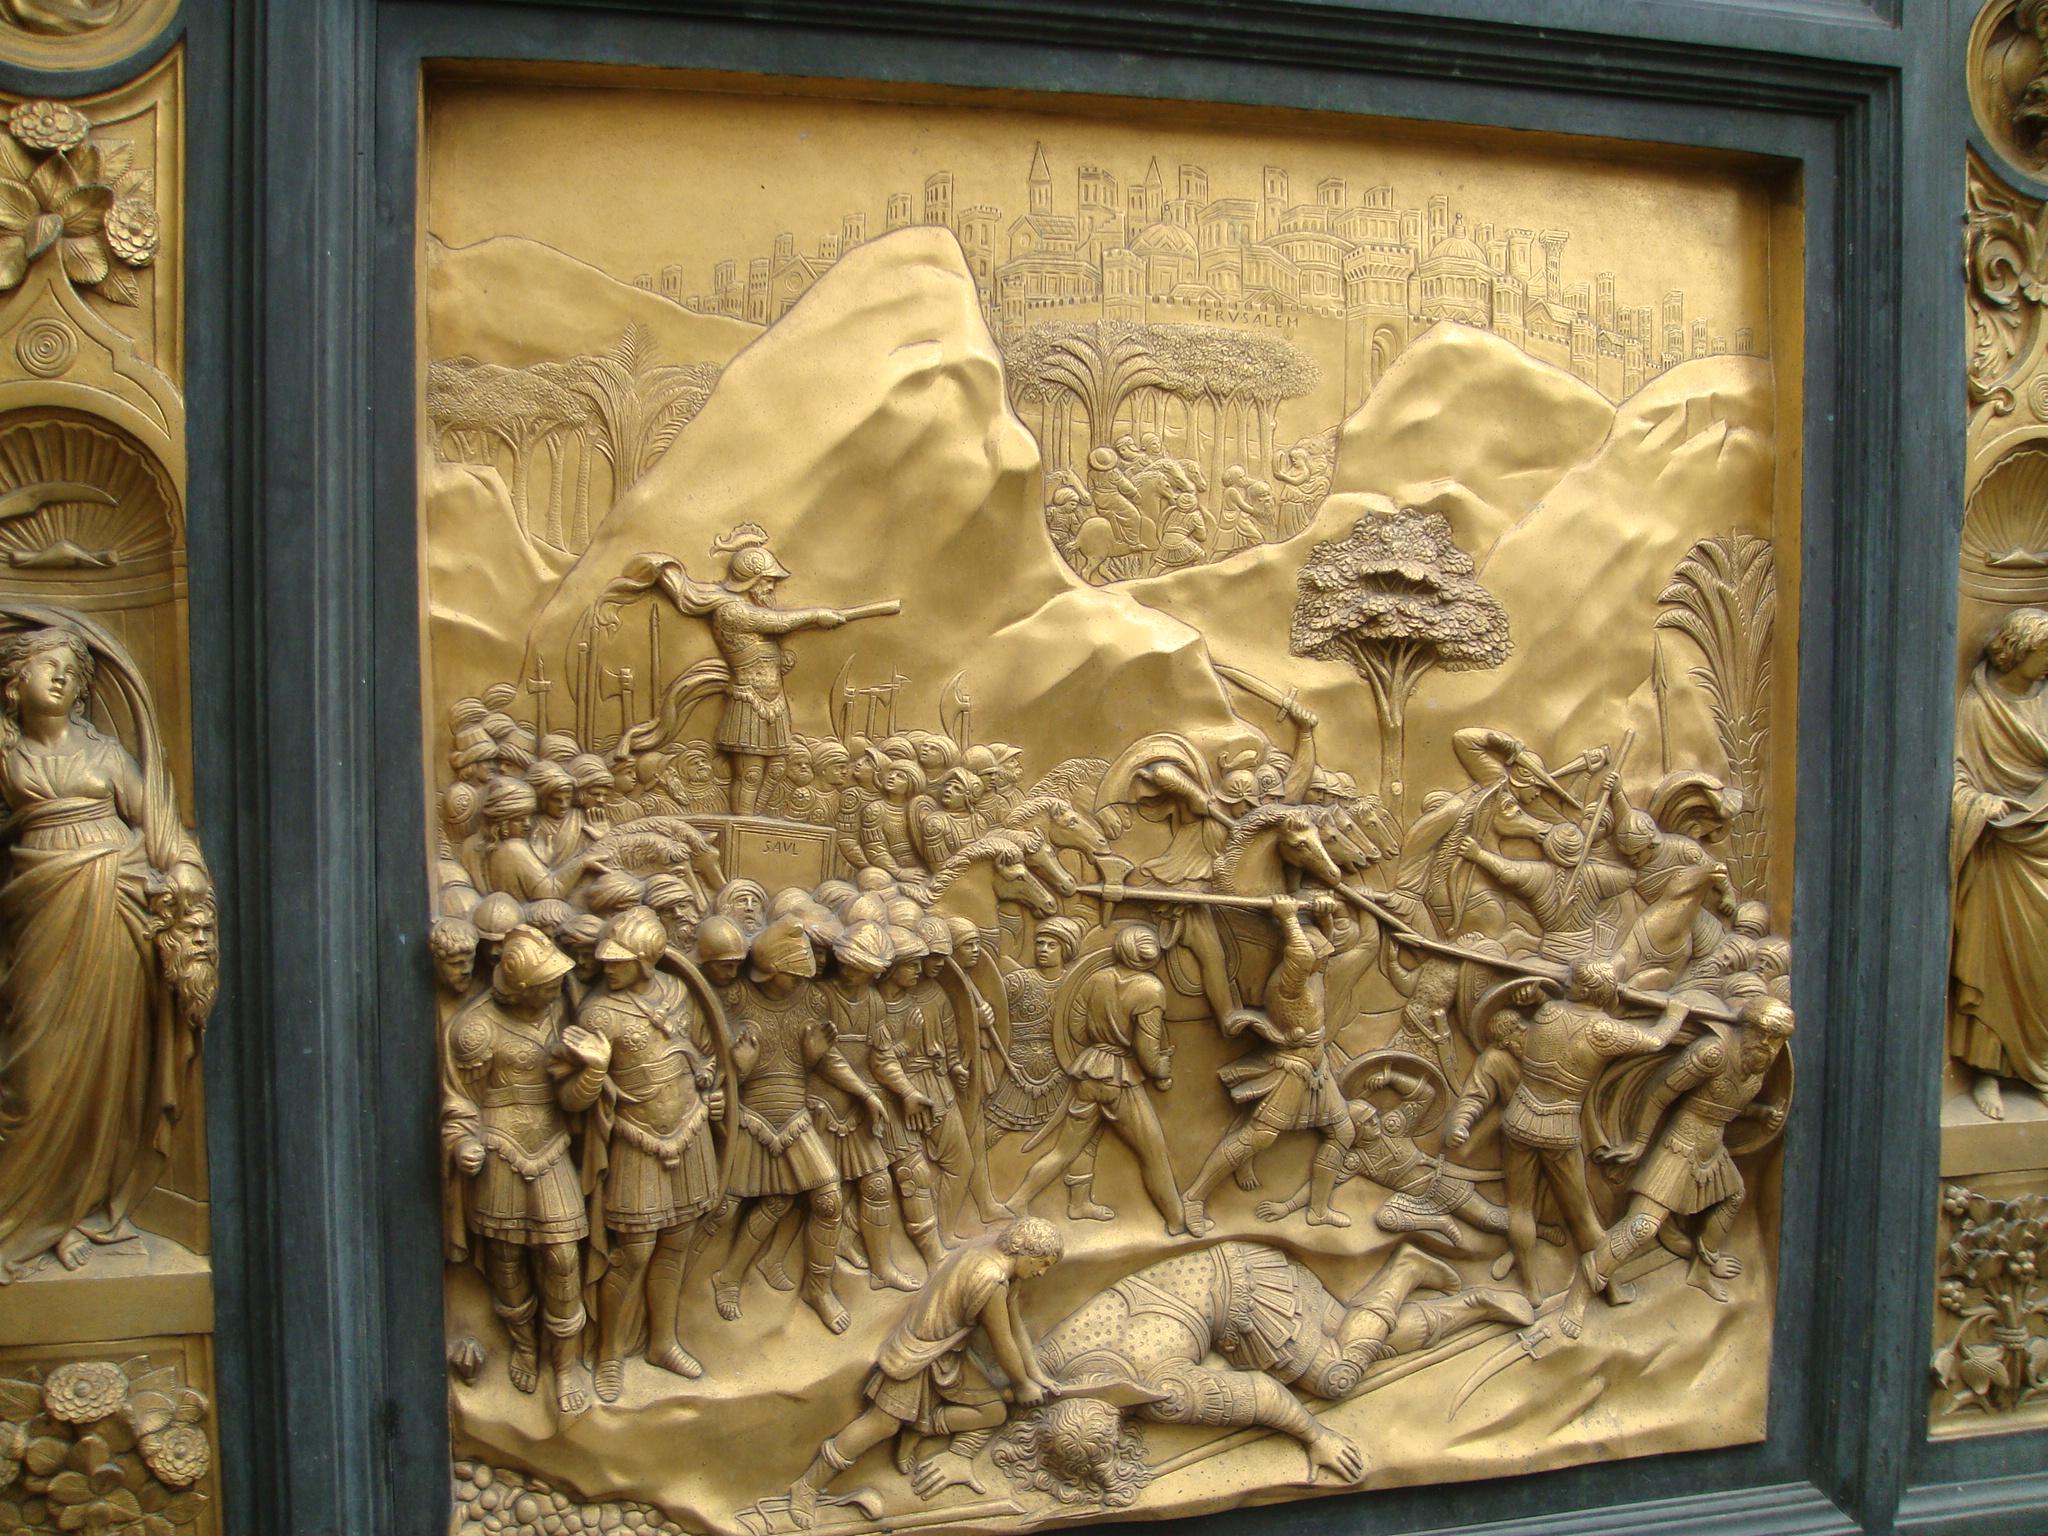 Ghiberti\u0027s door of David and Goliath & Ghiberti\u0027s Gates of Paradise: Florence Art History 101 | Vino Con ... Pezcame.Com